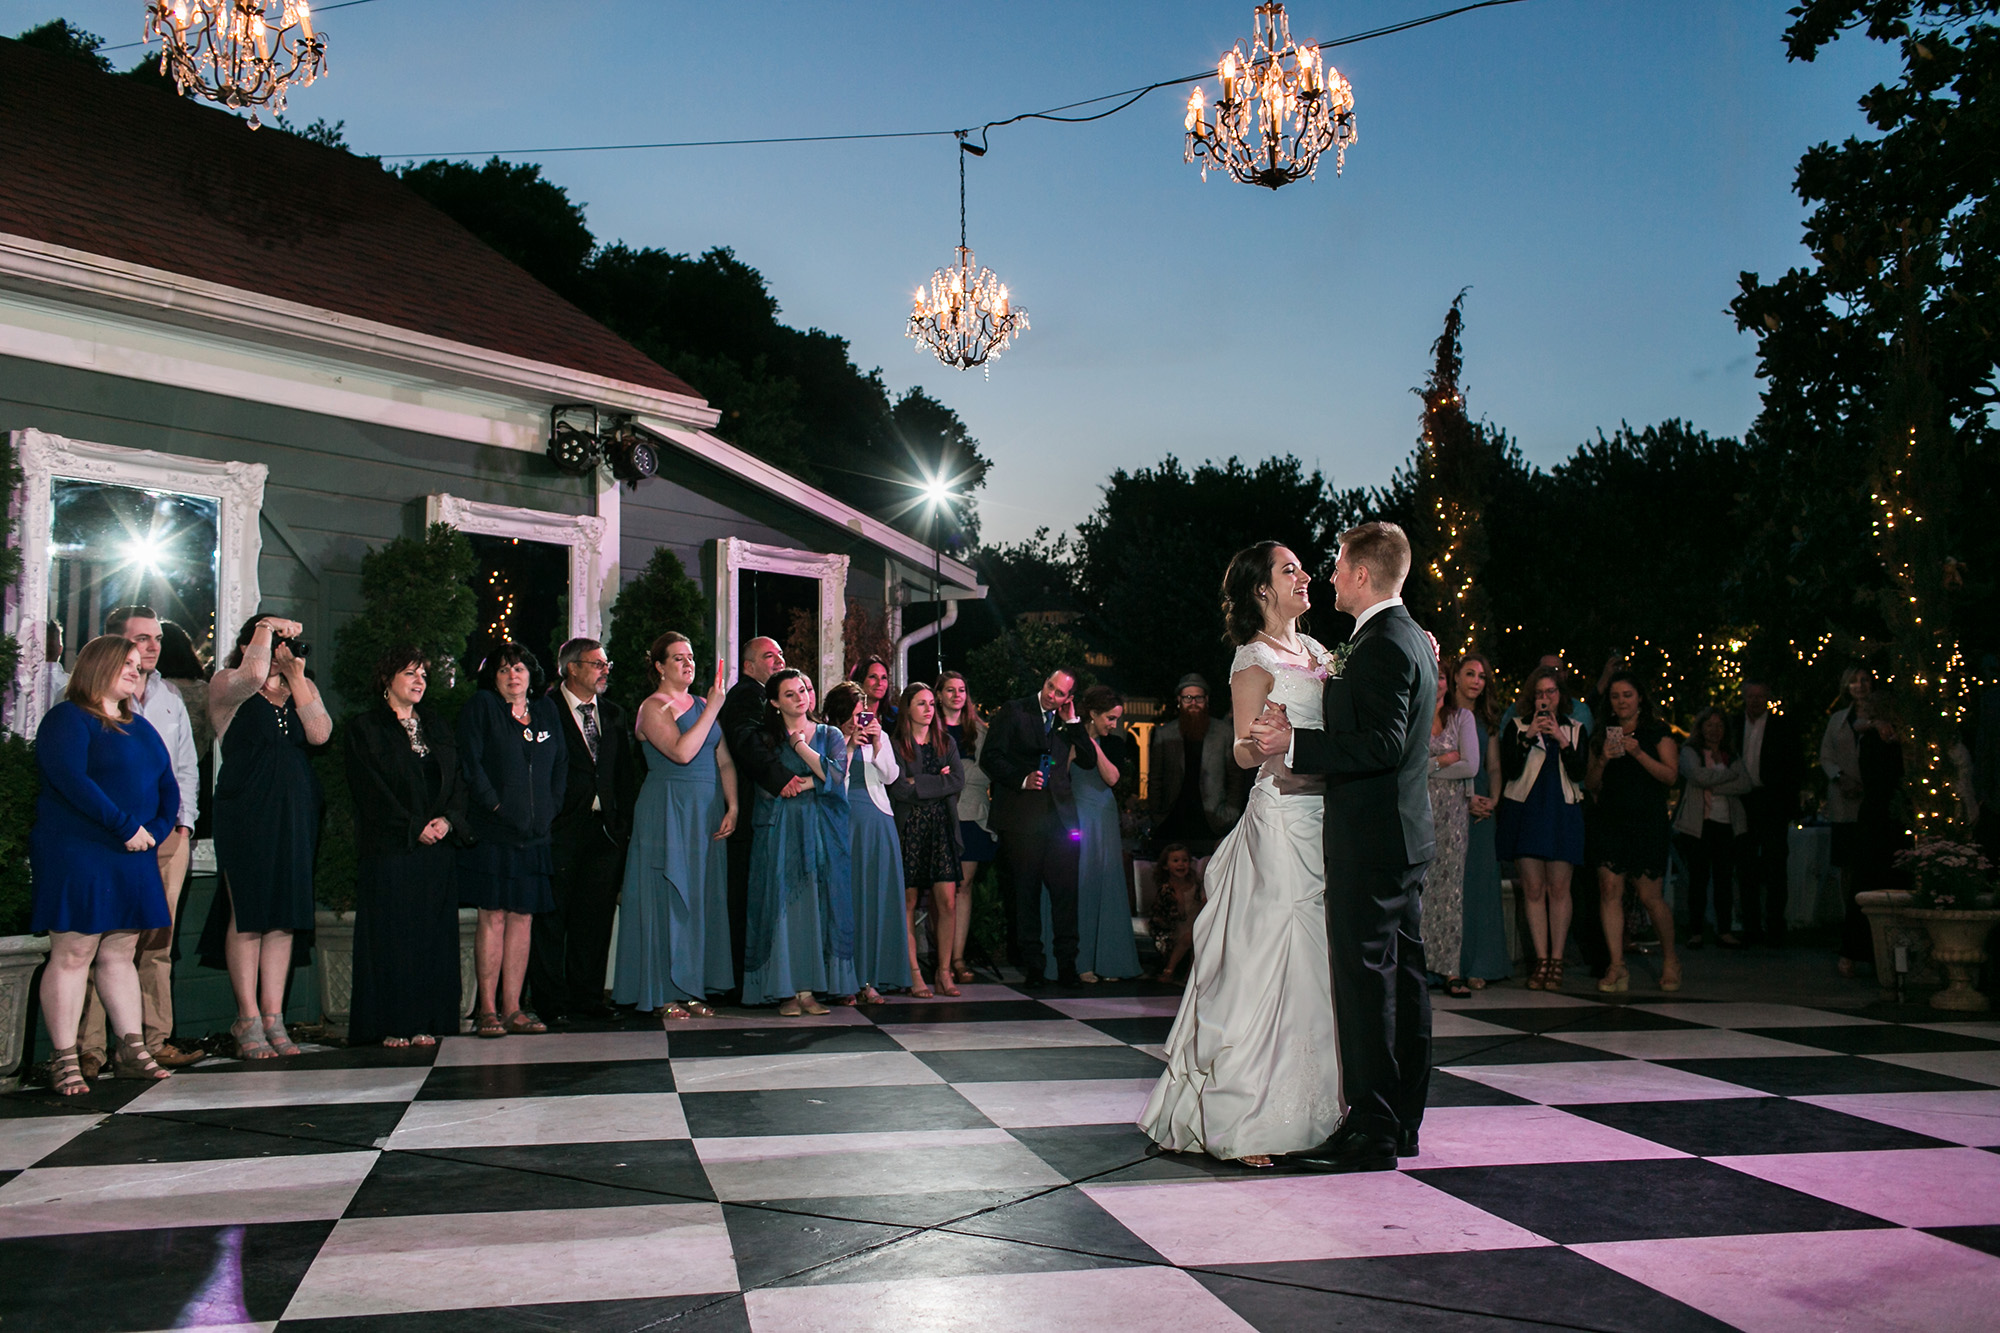 associate-photographer-christmas-house-wedding-carrie-vines-0065.jpg